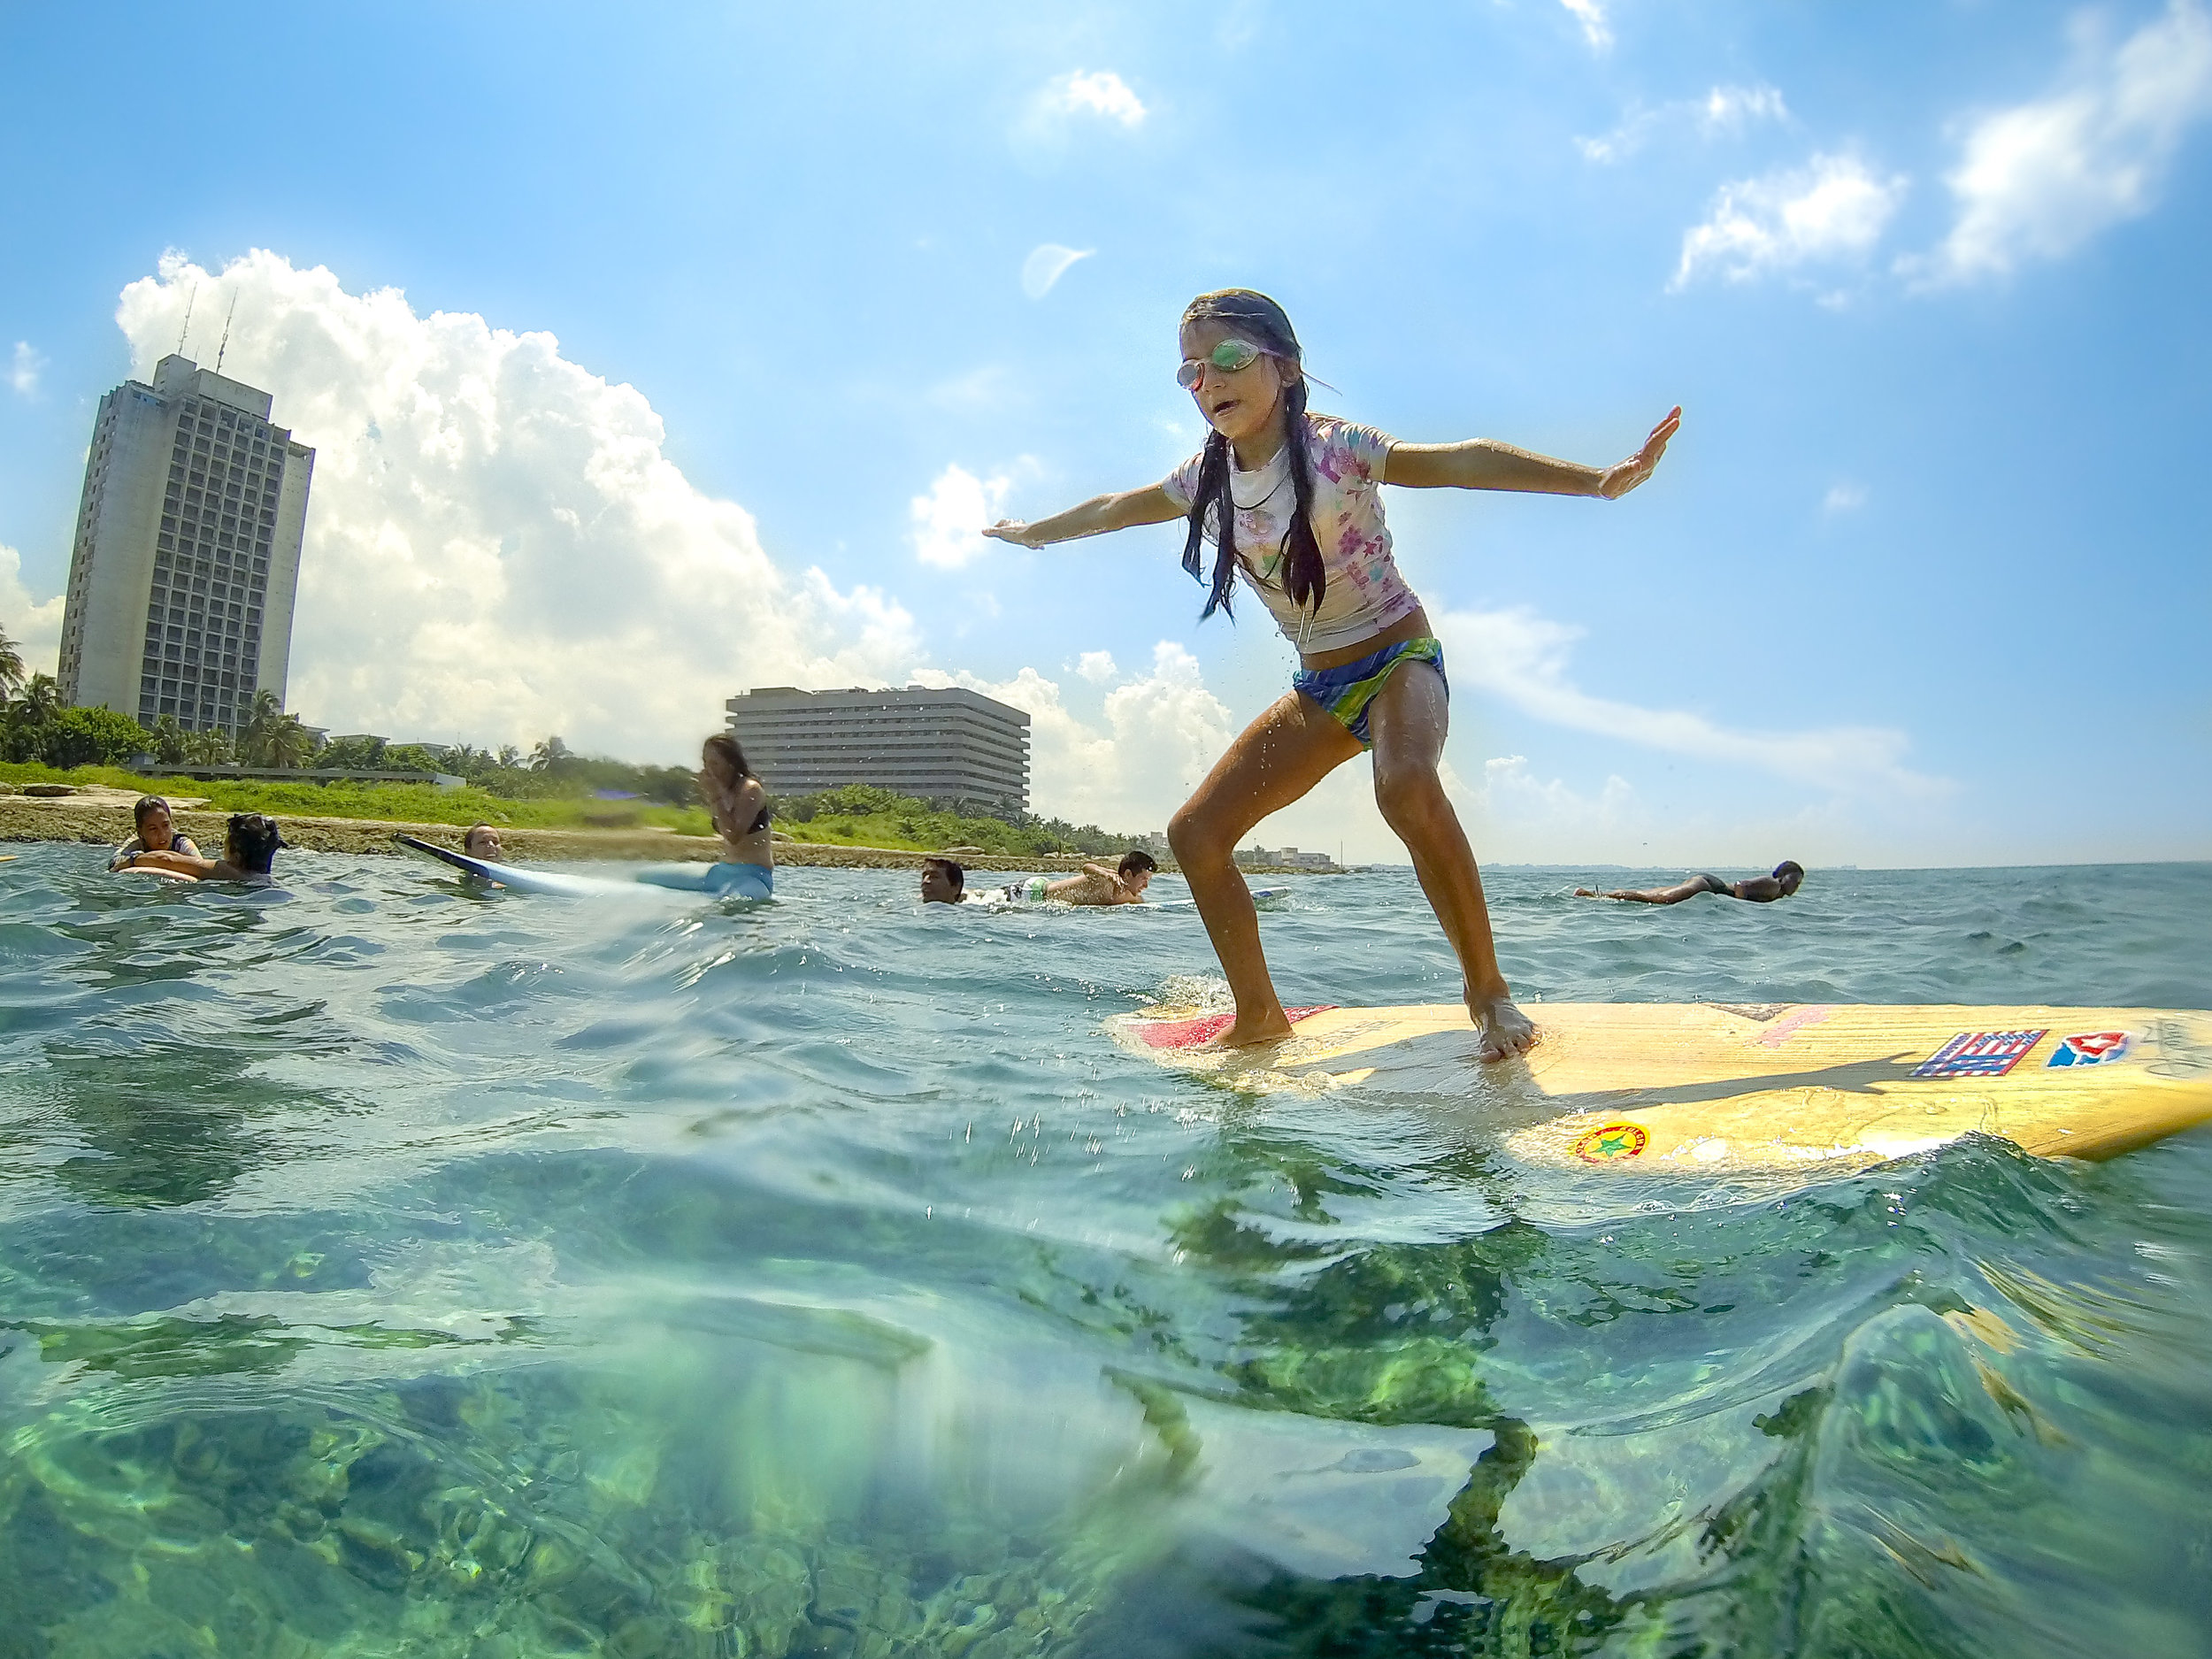 olapi-creative-cuba-trip-surf-community